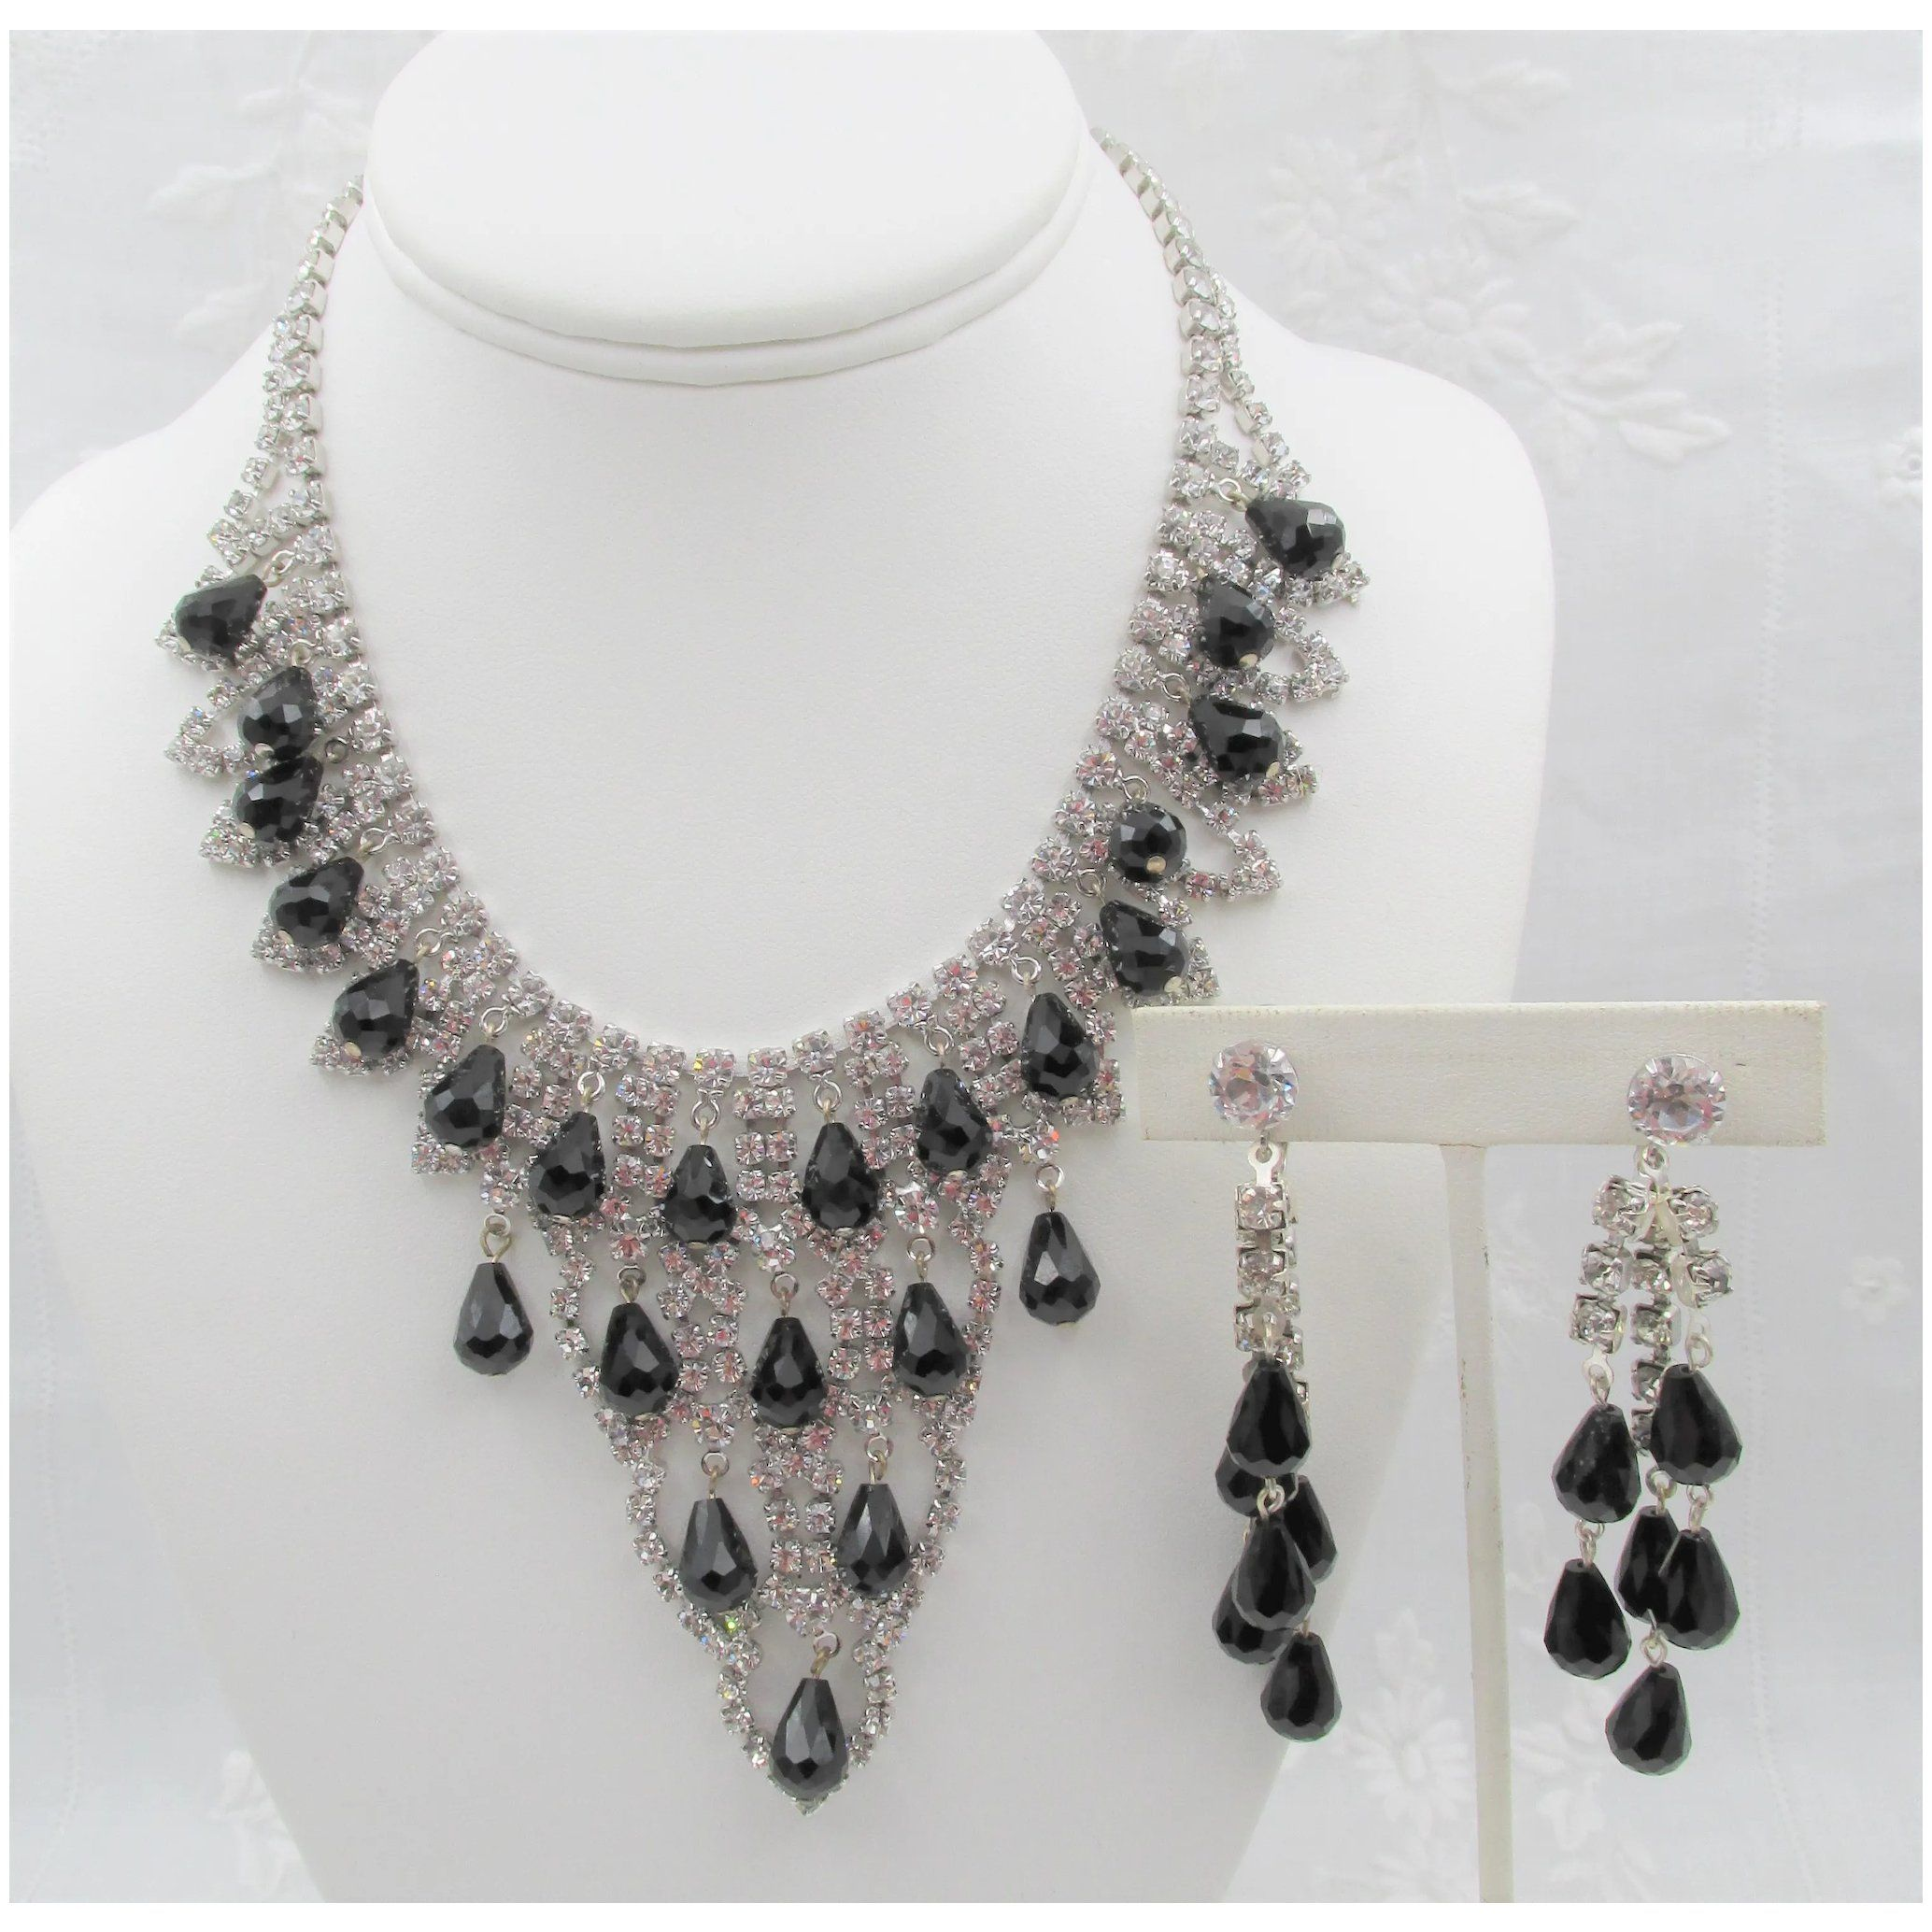 Kramer of New York Rhinestone Necklace Earrings Set